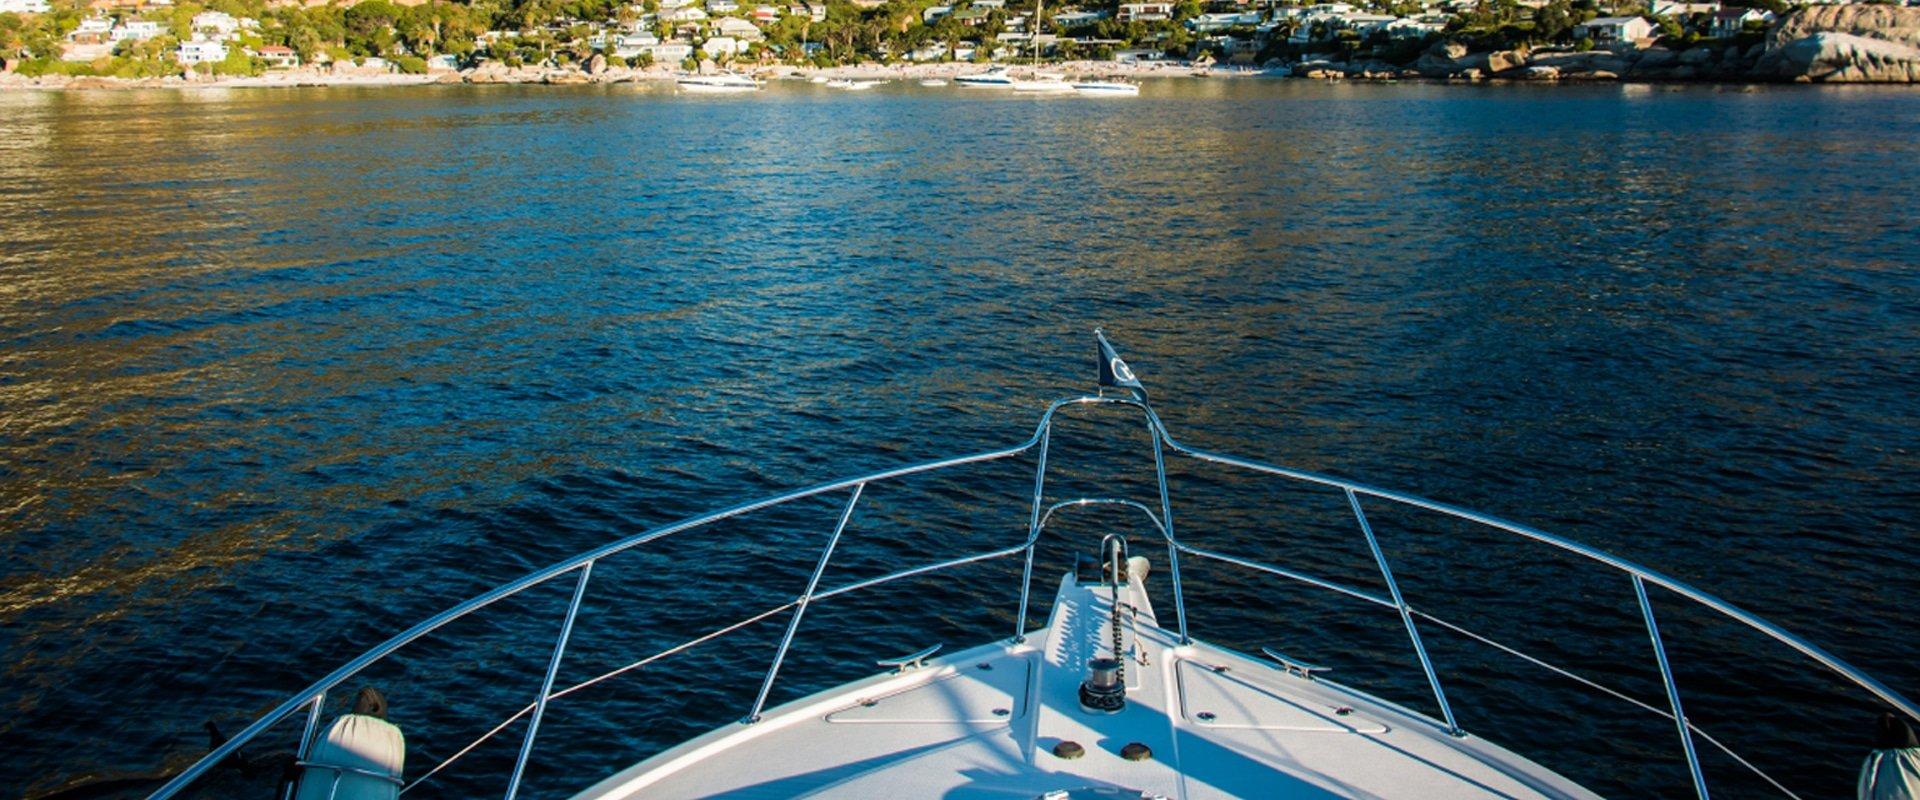 Enjoy a luxurious sailing trip to Cape Town's beautiful Clifton beach